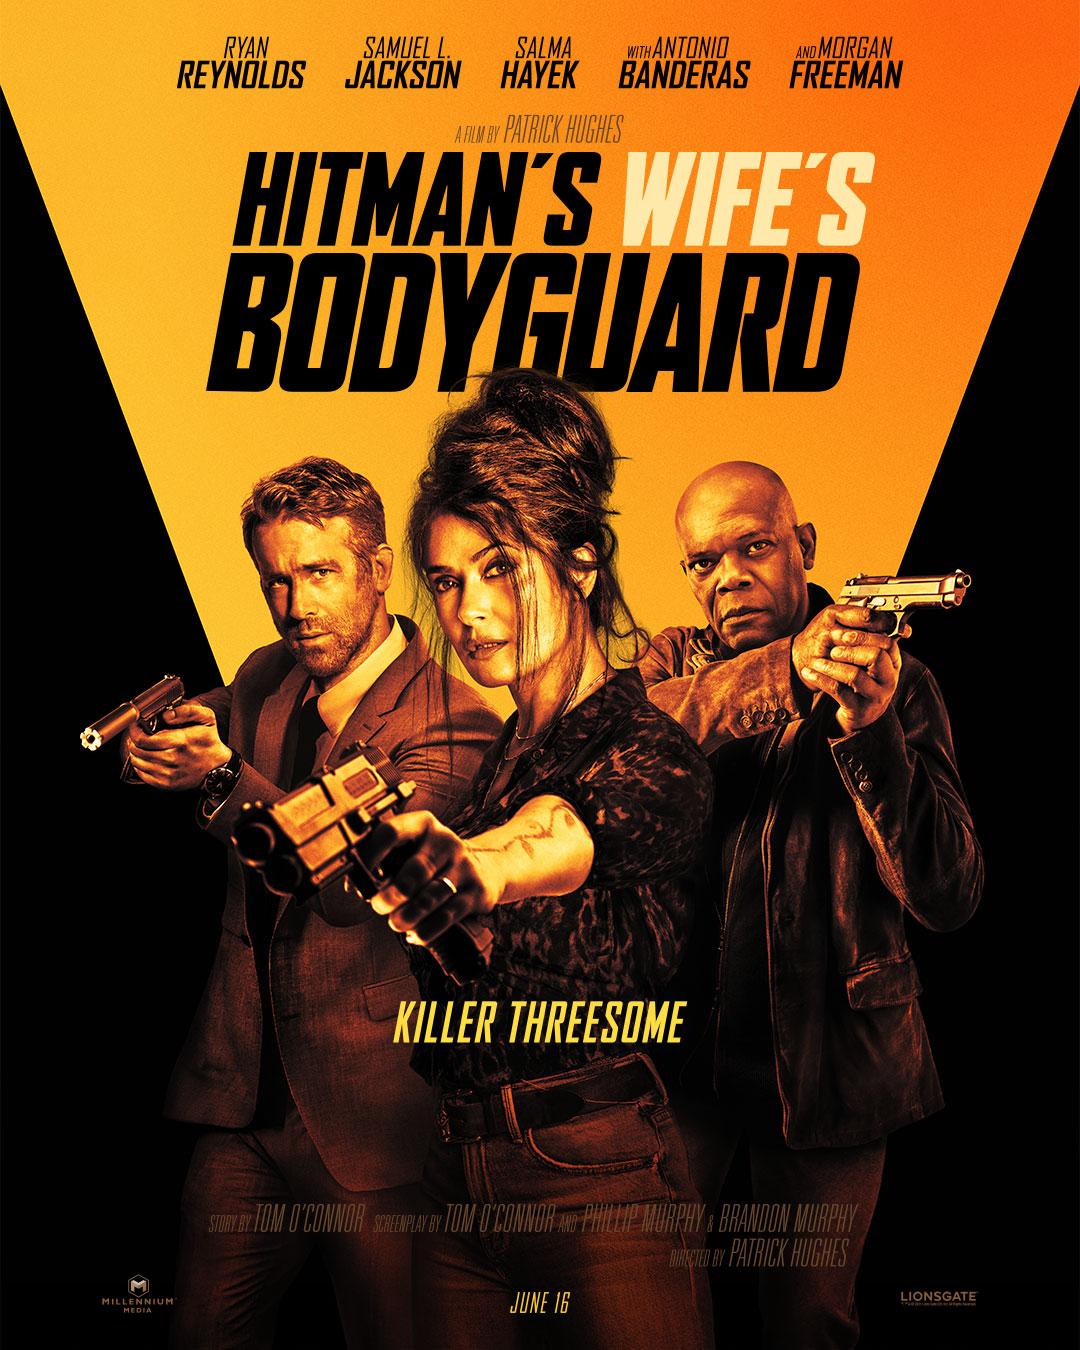 The Hitman's Wife's Bodyguard (2021) Telugu Dubbed (Voice Over) & English [Dual Audio] WebRip 720p [1XBET]